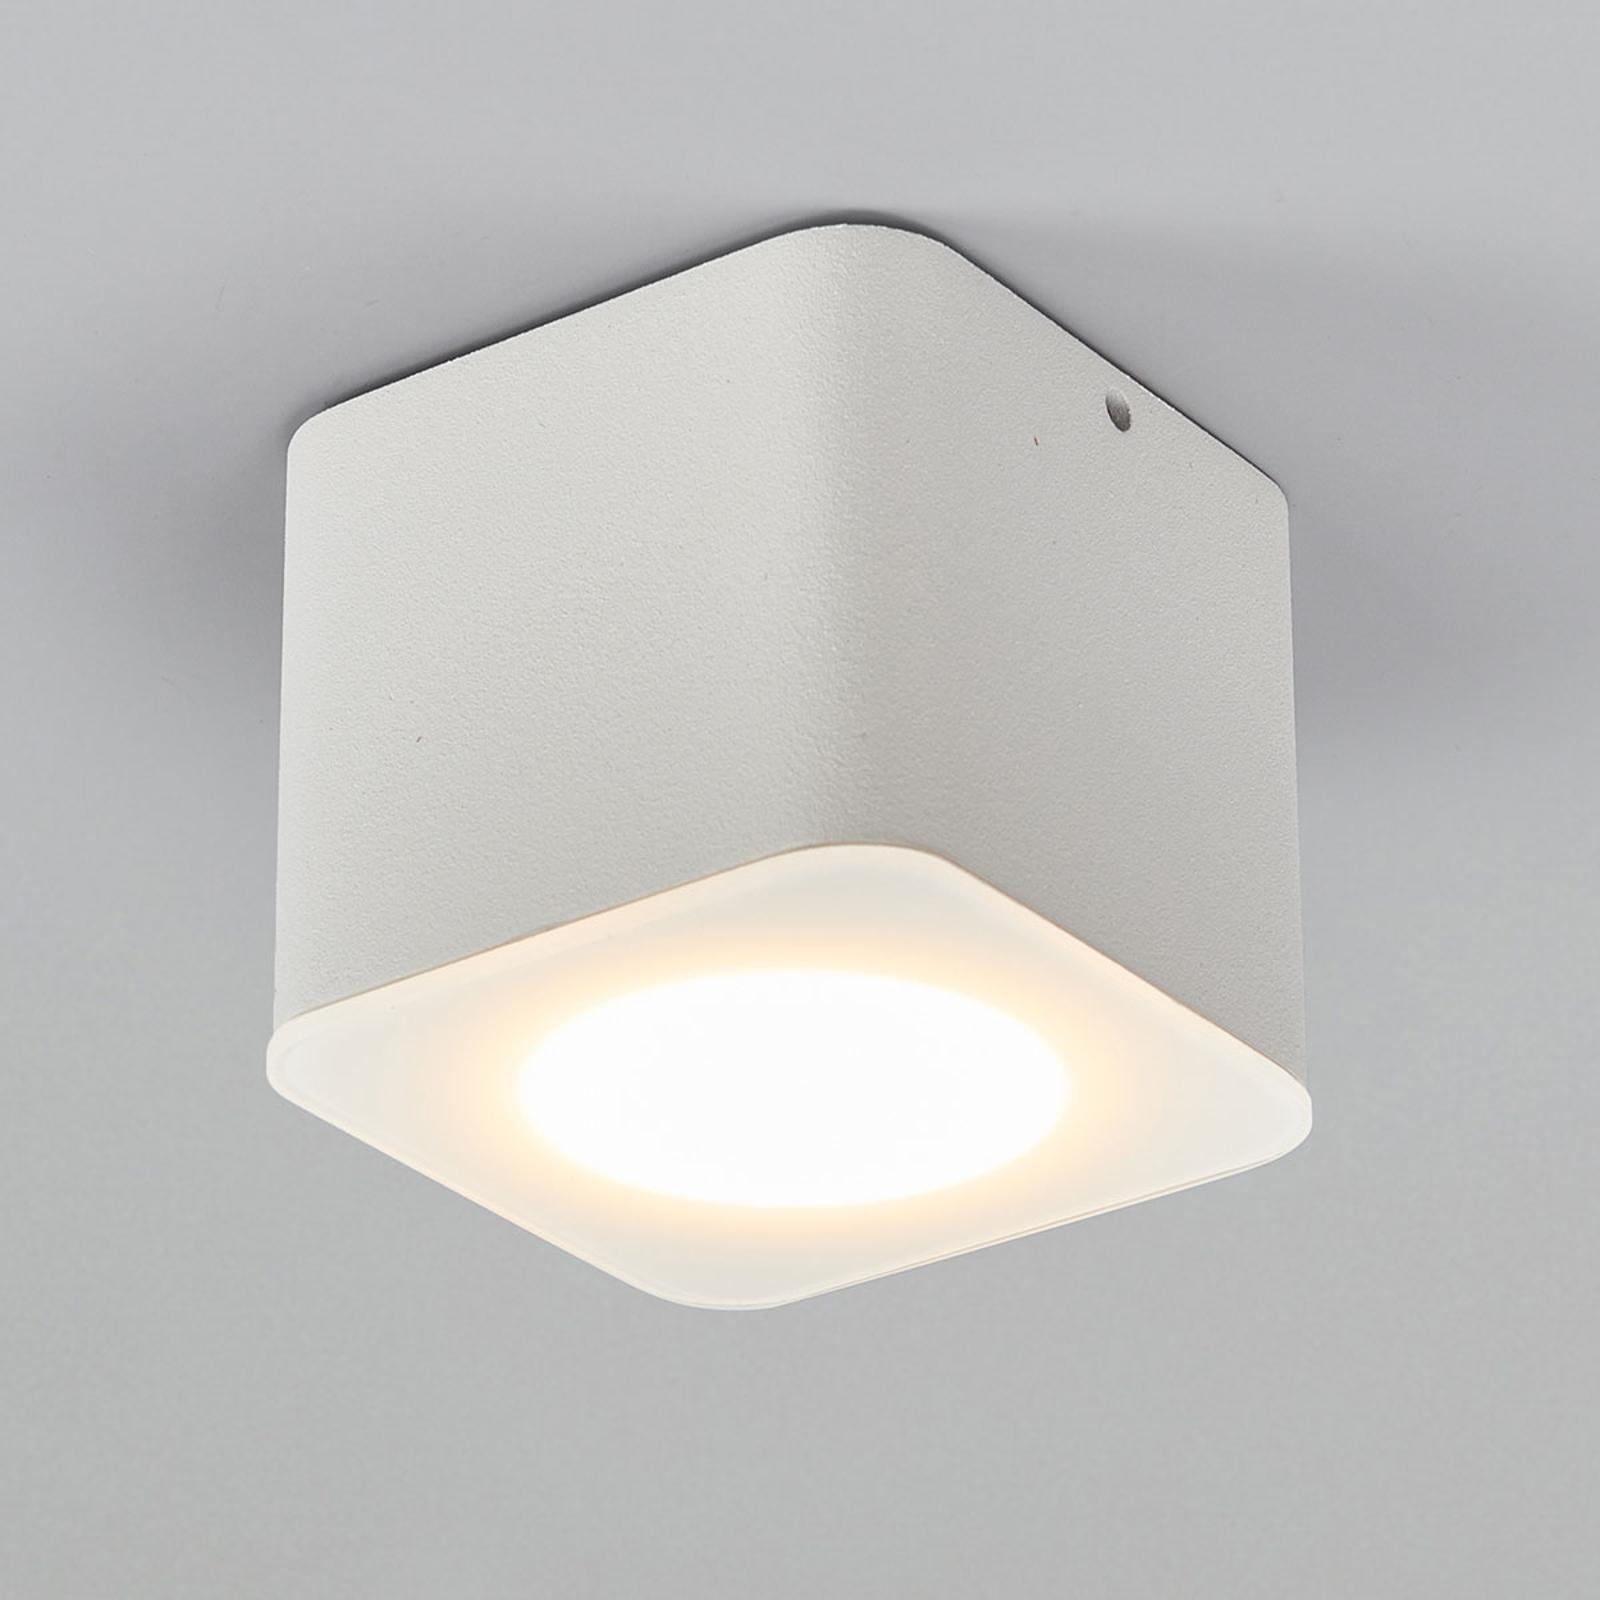 Helestra Oso LED-loftspot, kantet, hvid mat